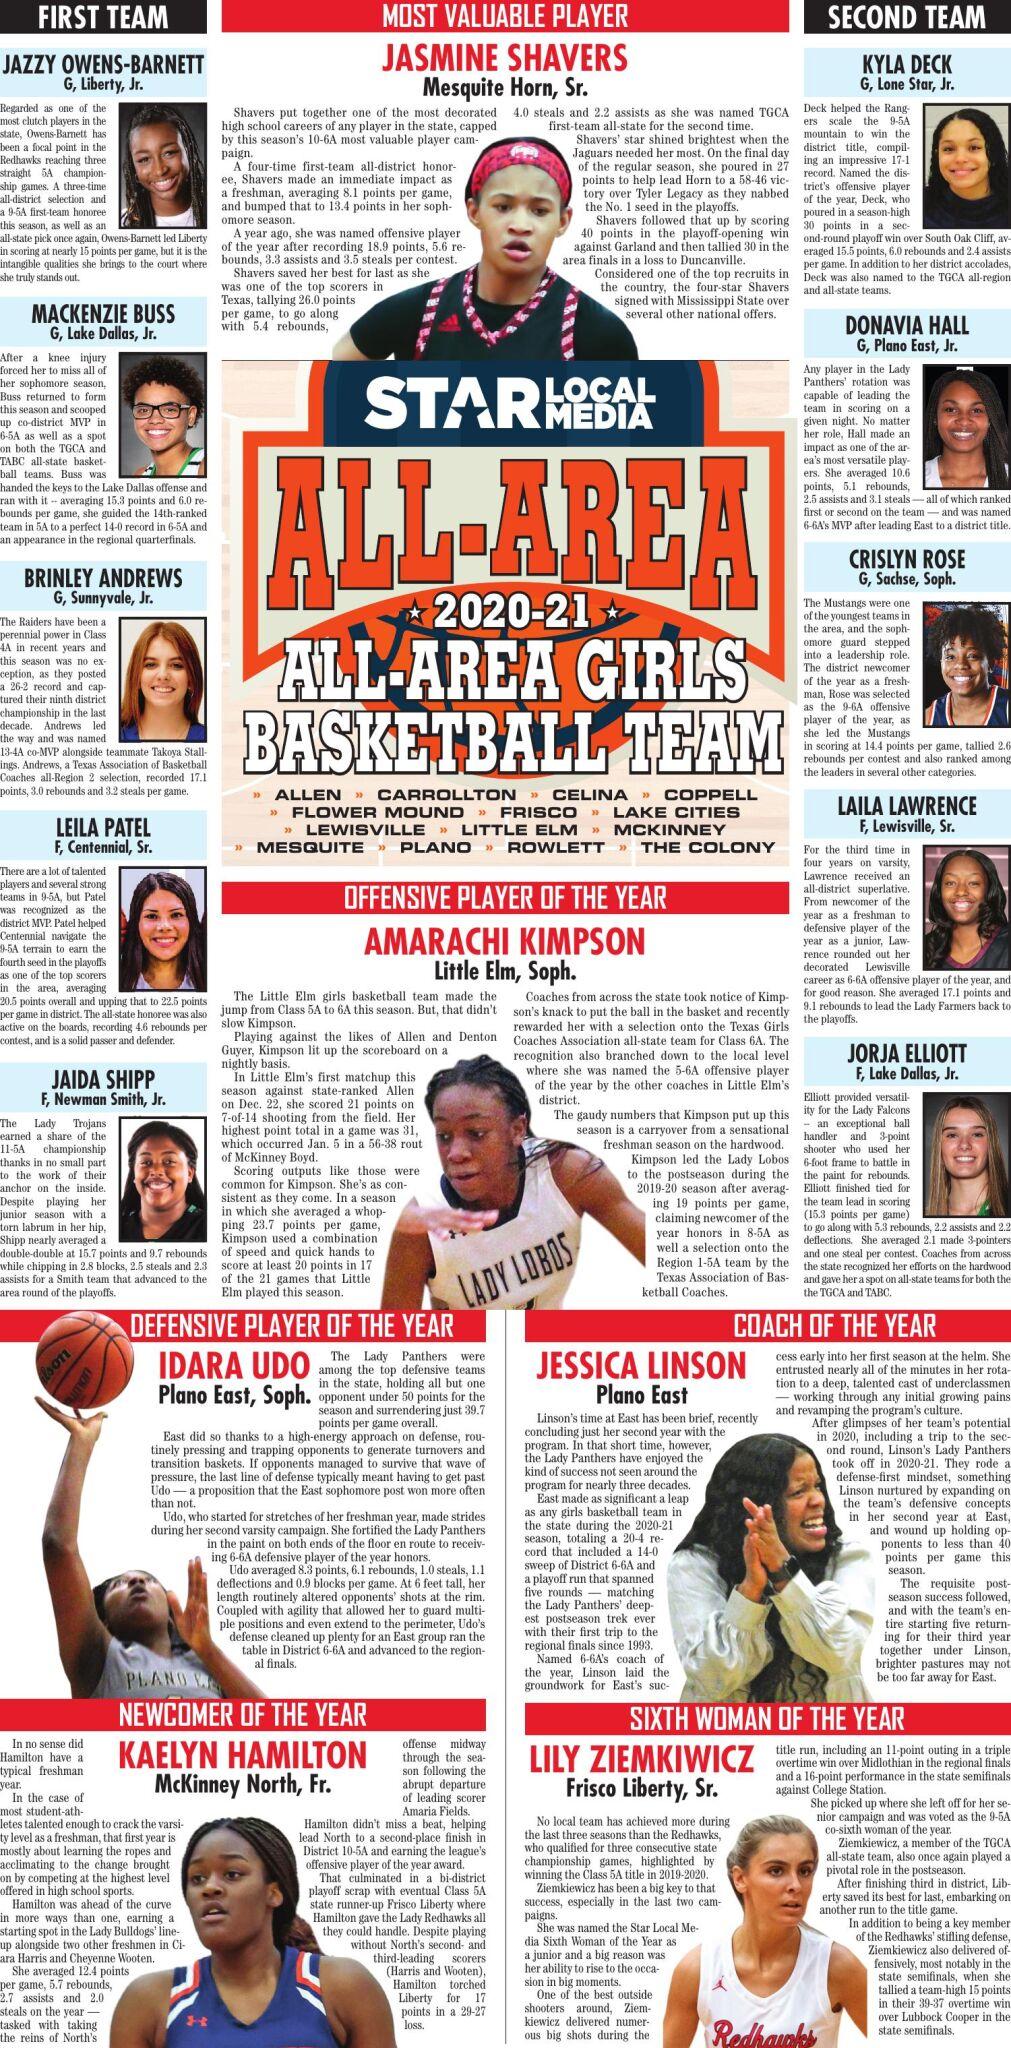 2020-21 Star Local Media All-Area Girls Basketball Team